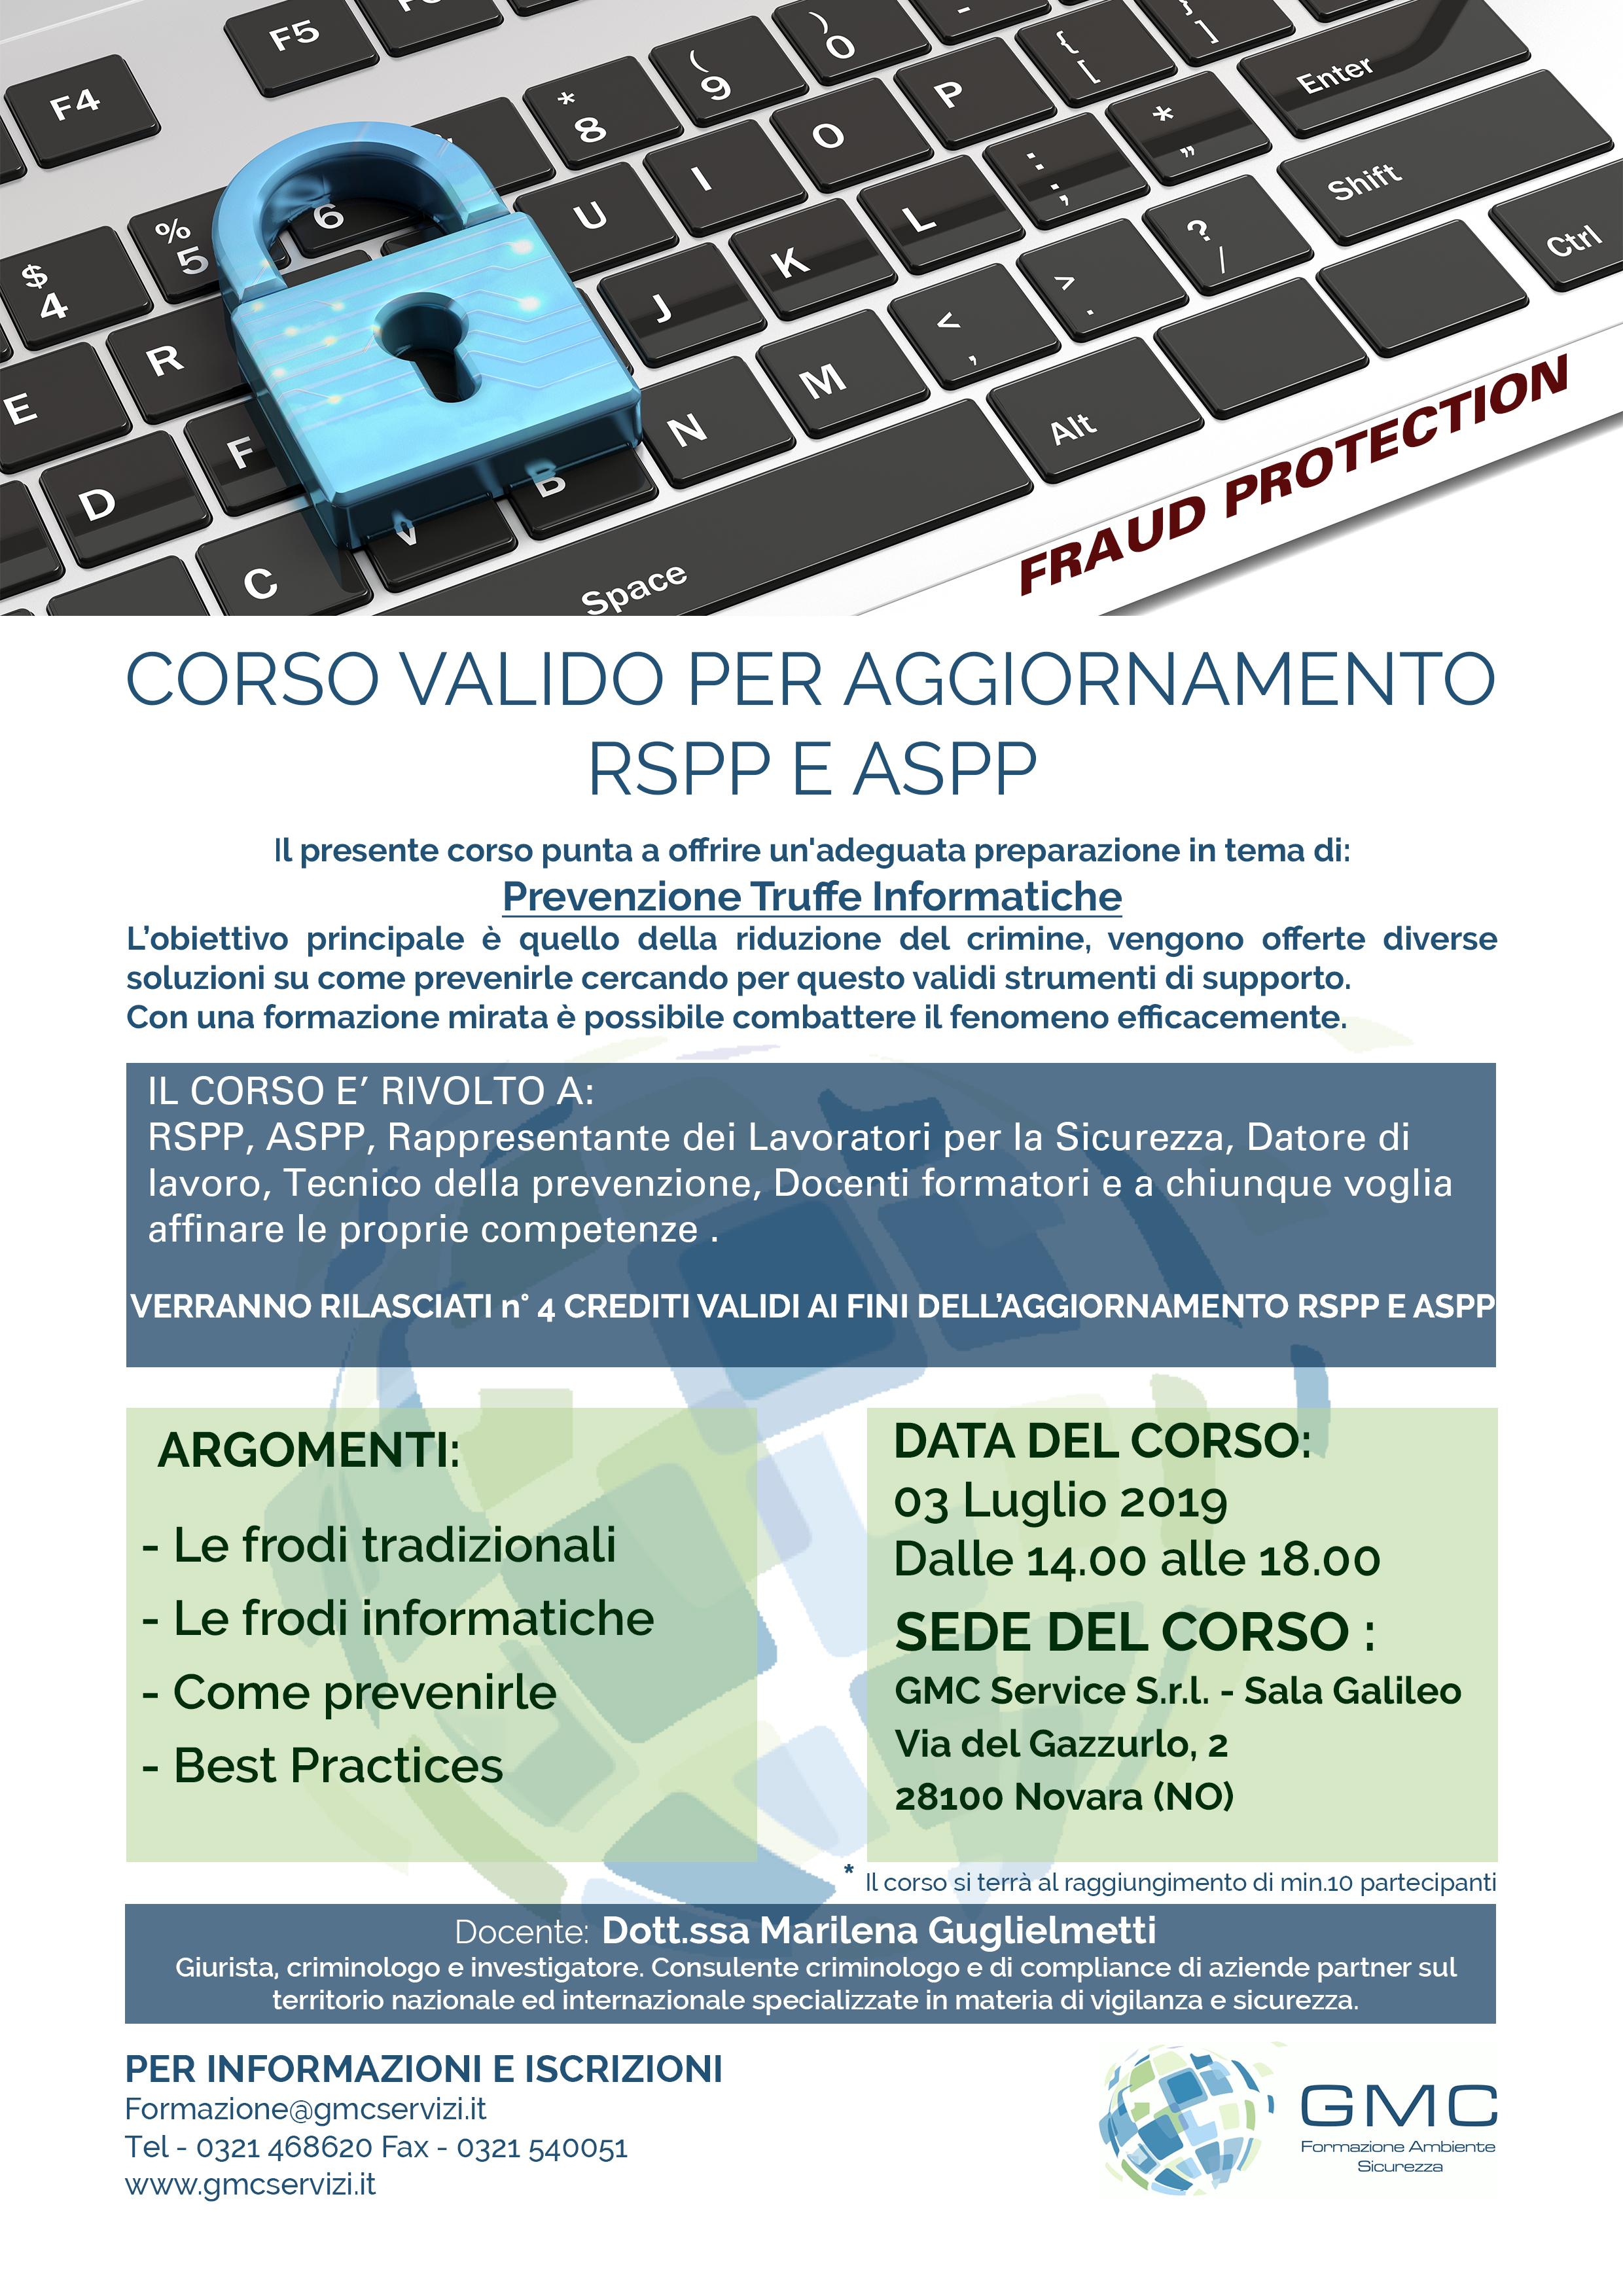 fraud-protection